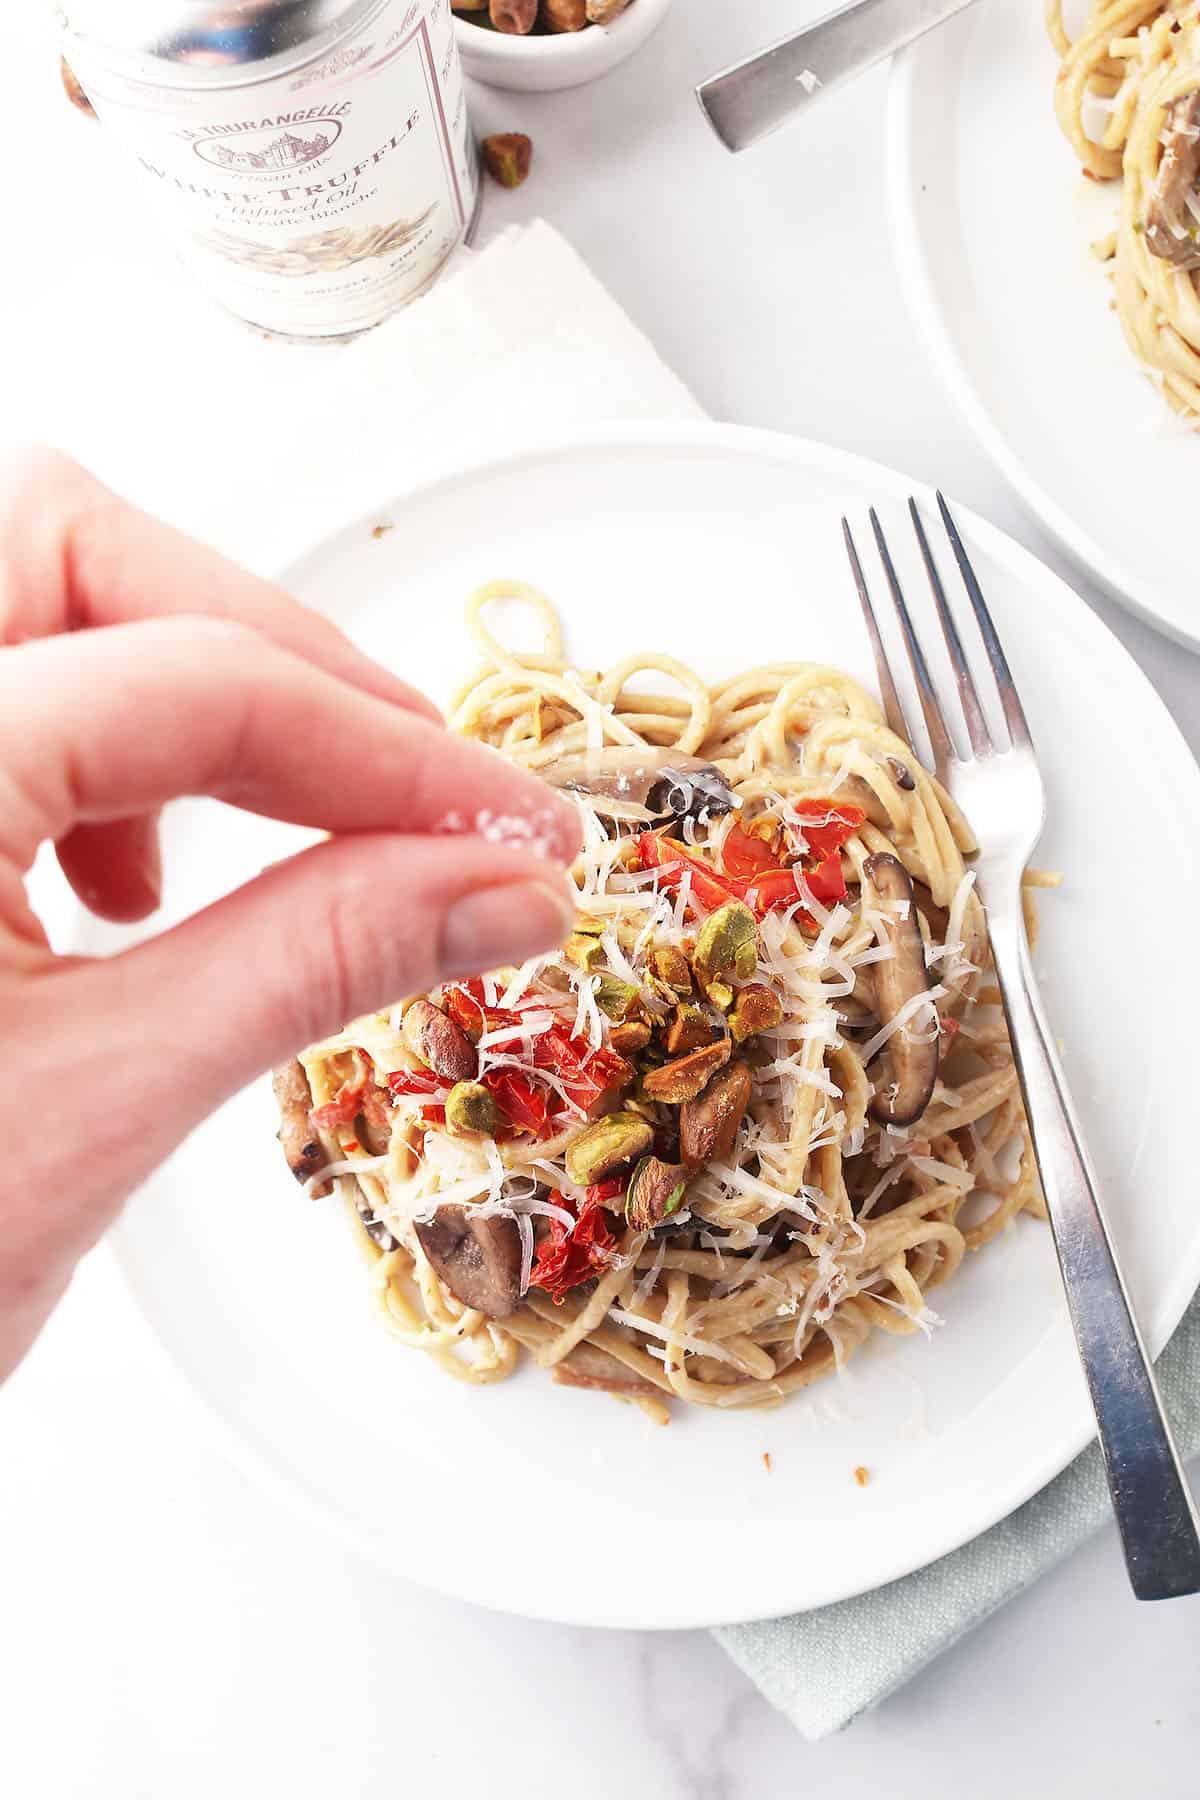 Truffle salt sprinkled on finished pasta